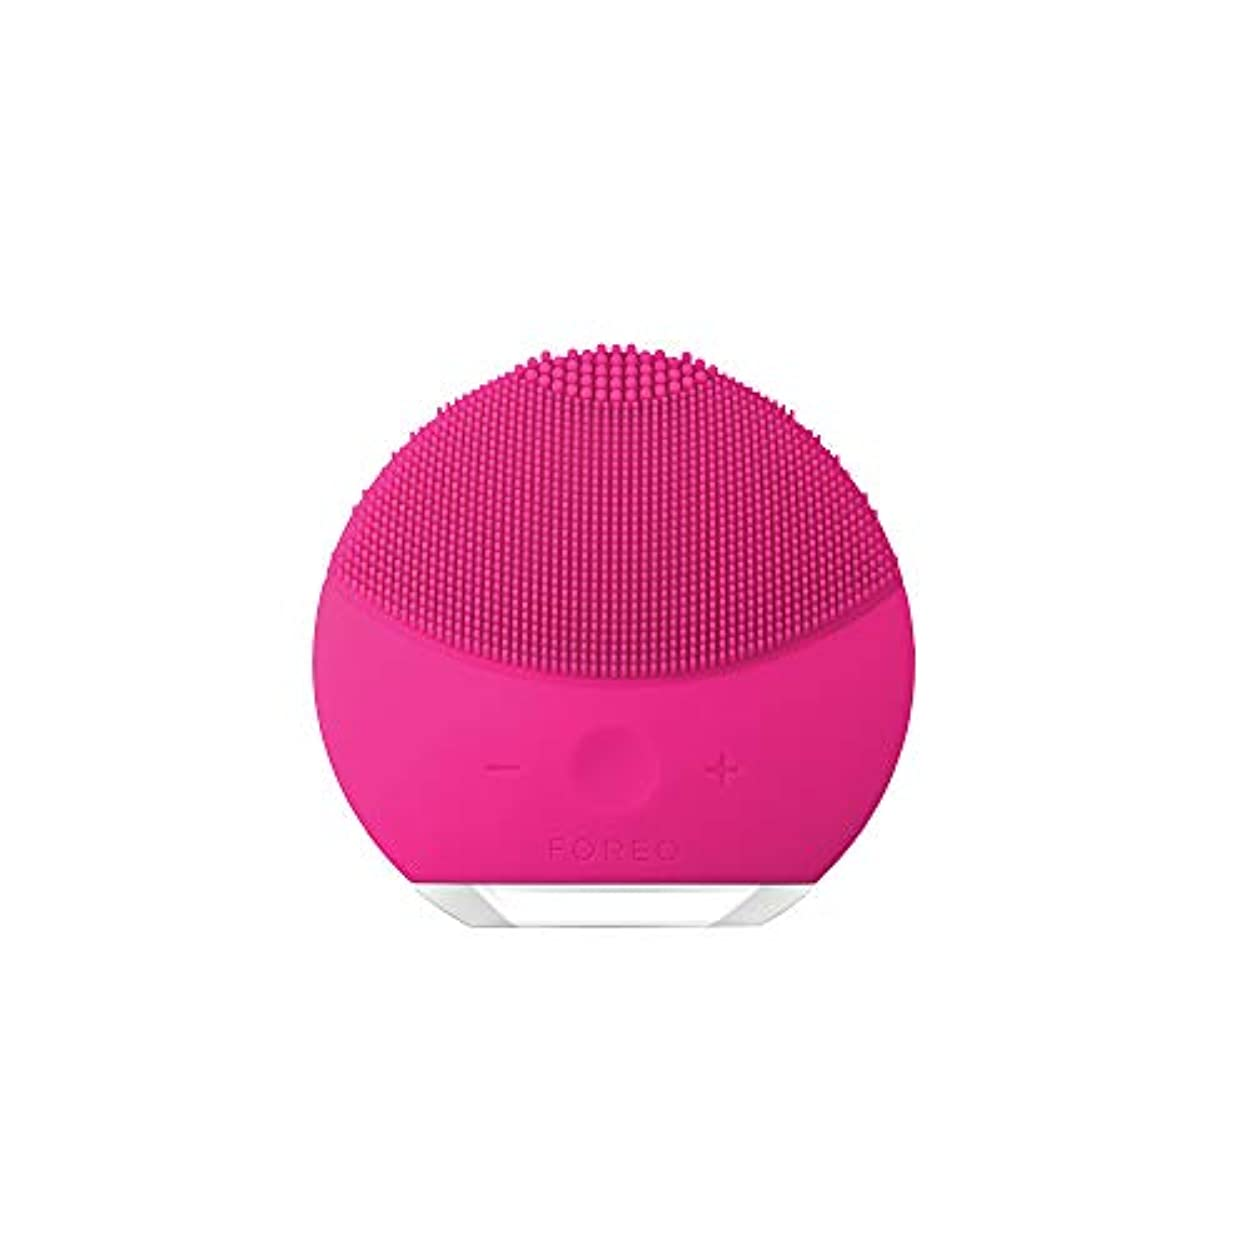 FOREO LUNA mini 2 フクシア 電動洗顔ブラシ シリコーン製 音波振動